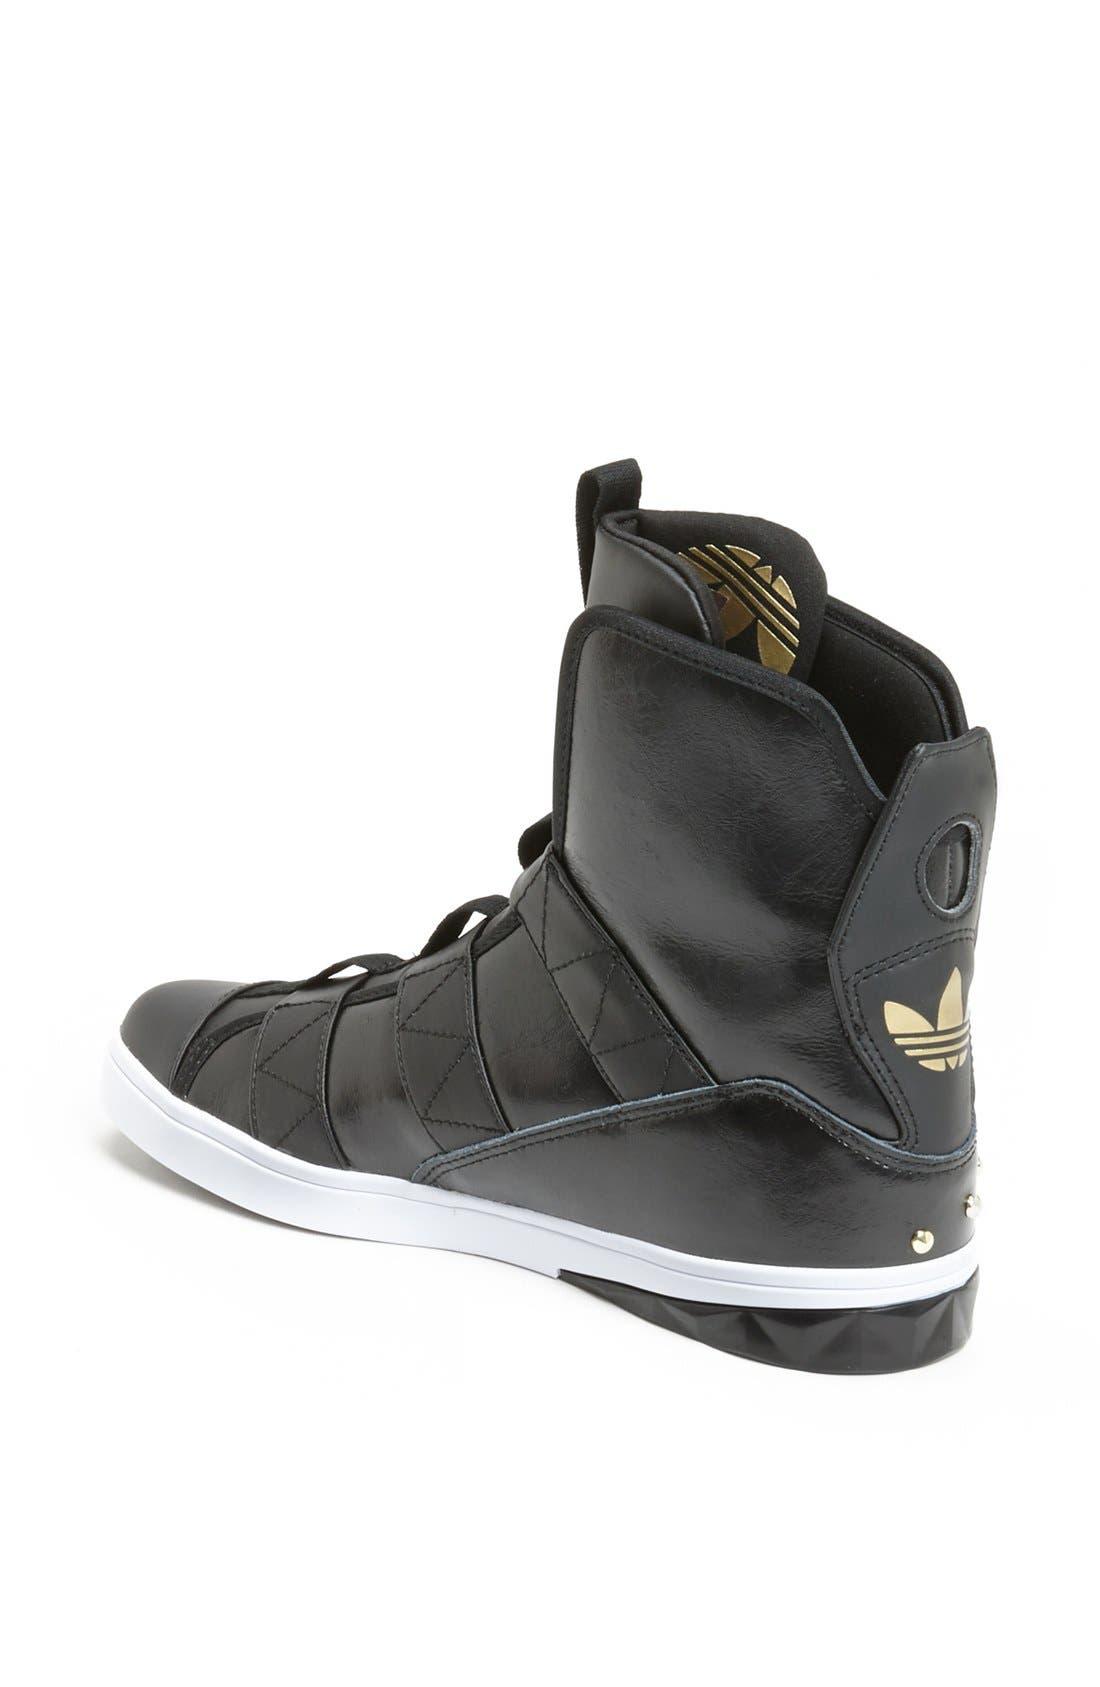 Alternate Image 2  - adidas 'Chic High' Sneaker (Women)